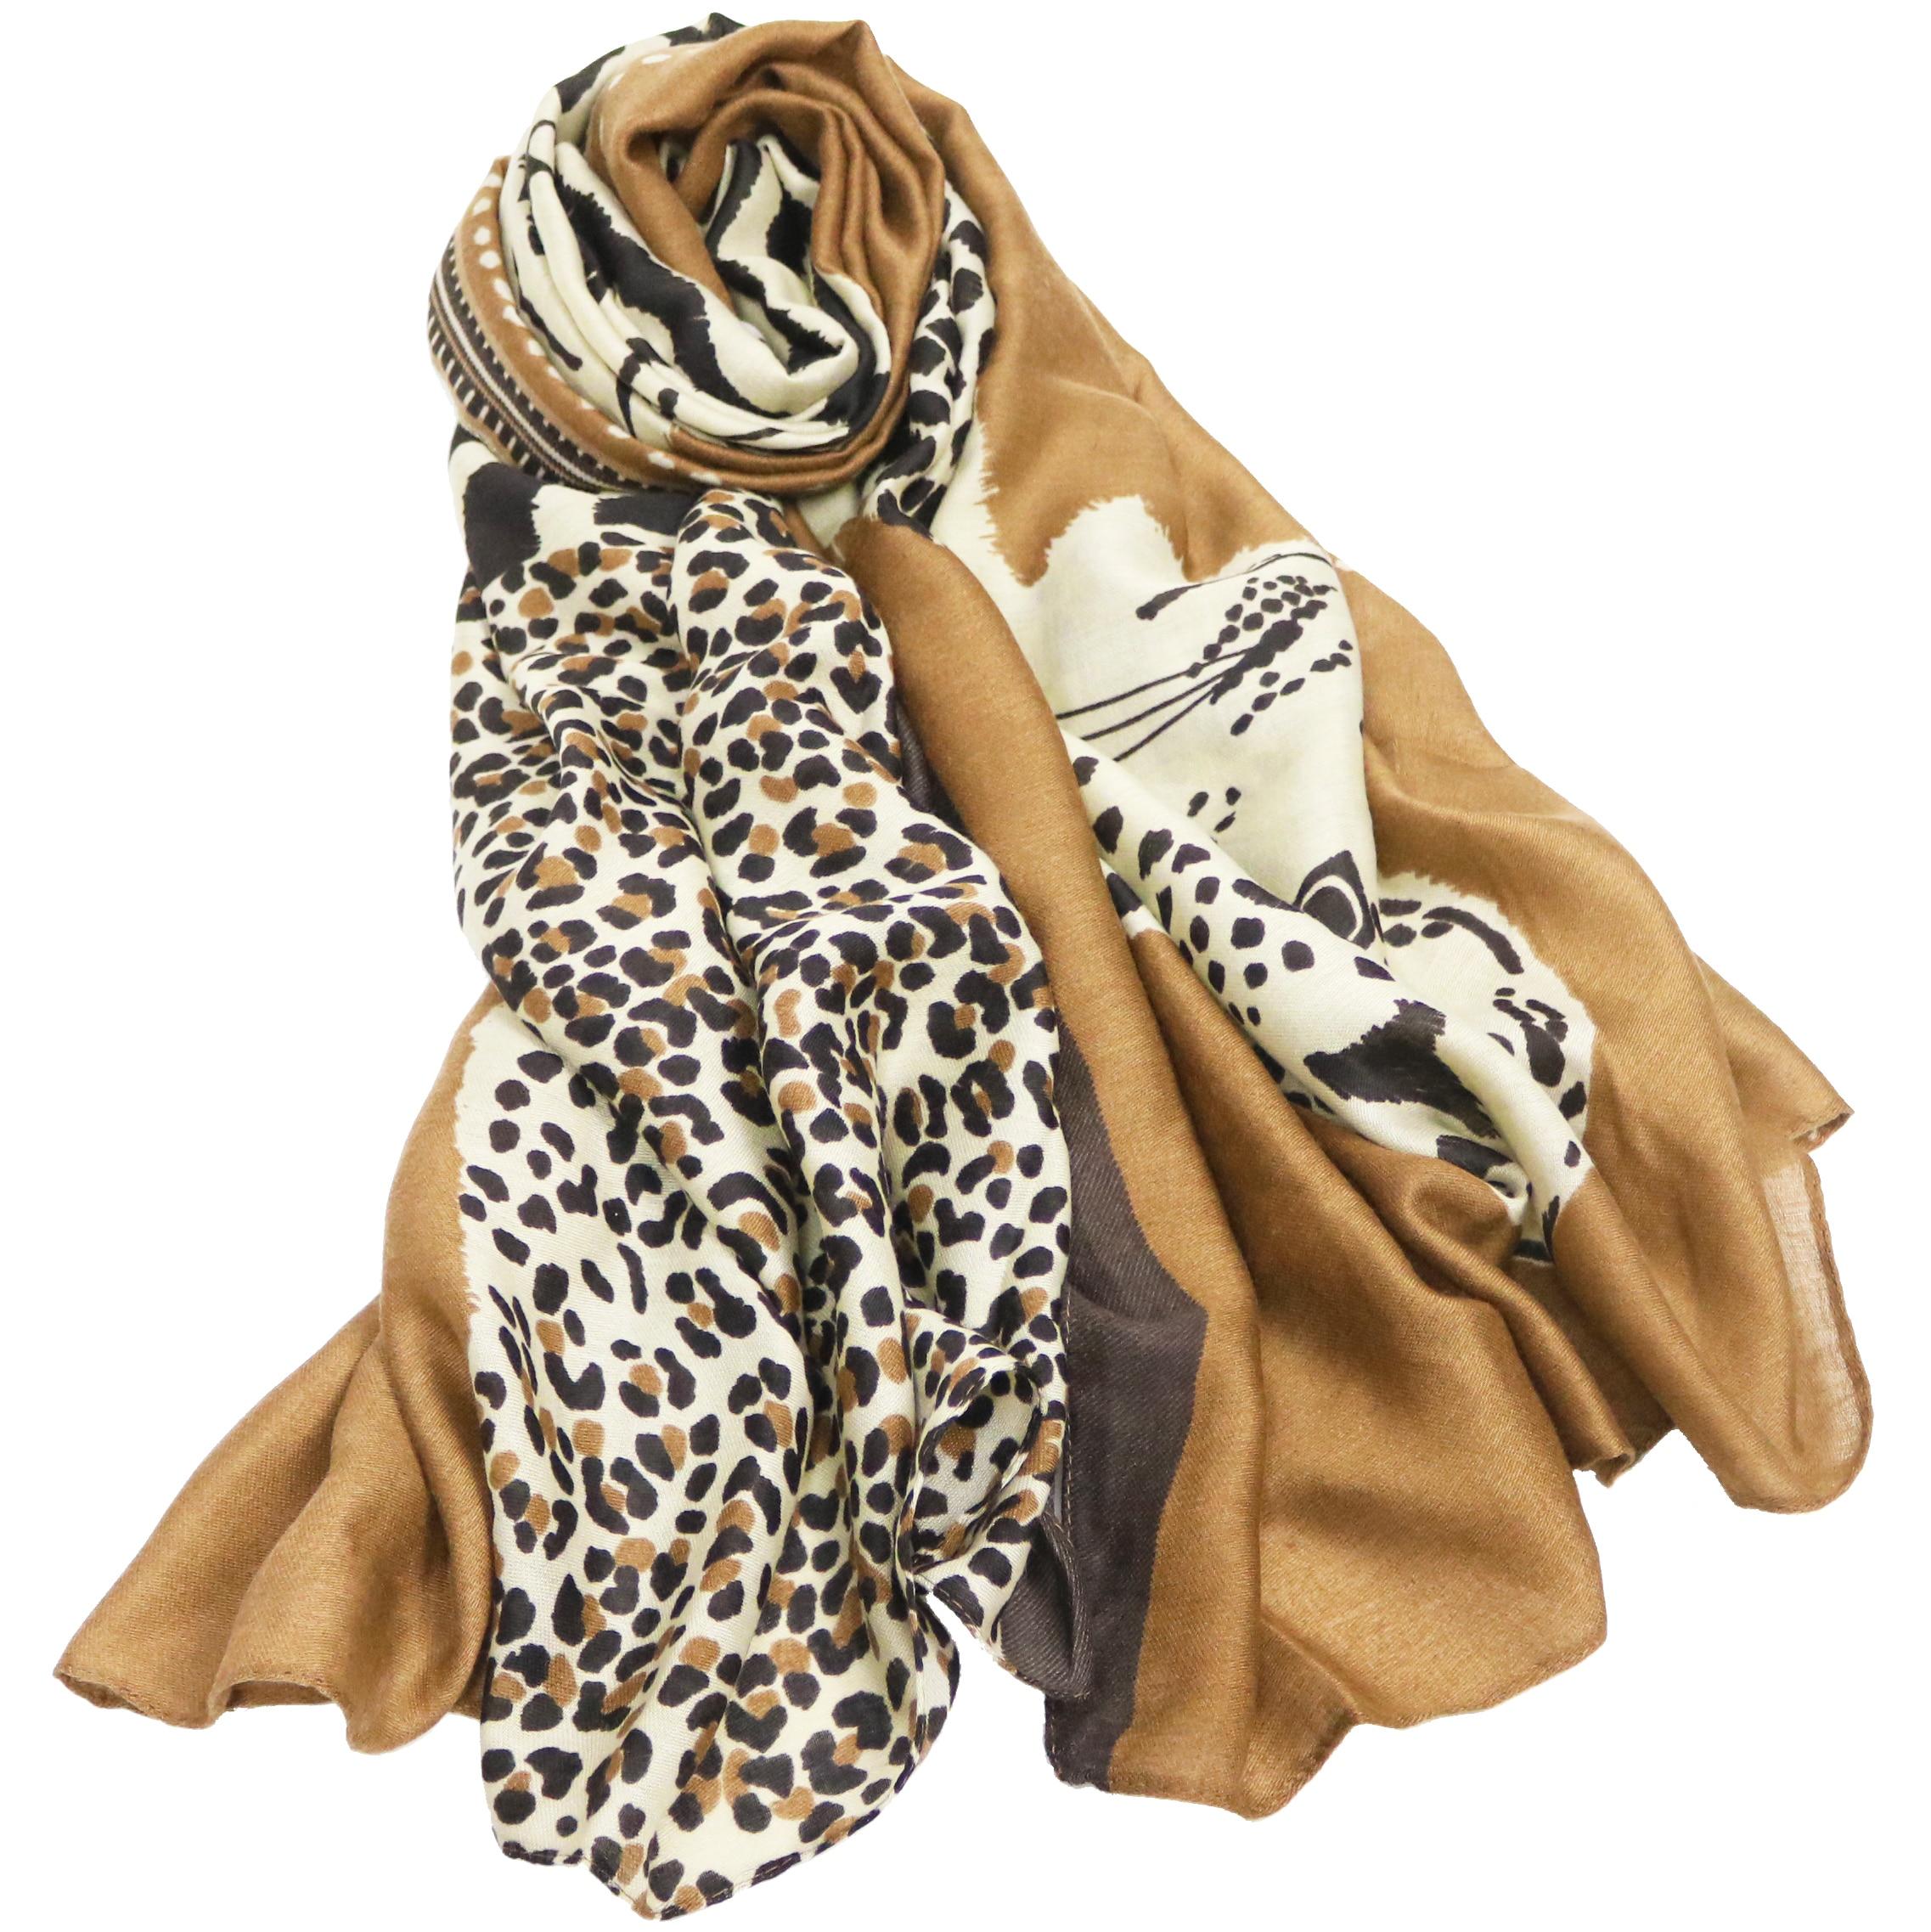 Scarf for Women Winter Leopard Tiger Pattern Long Shawl Autumn Animal Leopard Warm Pashmina Foulard Femme Echarpe Hiver Femme